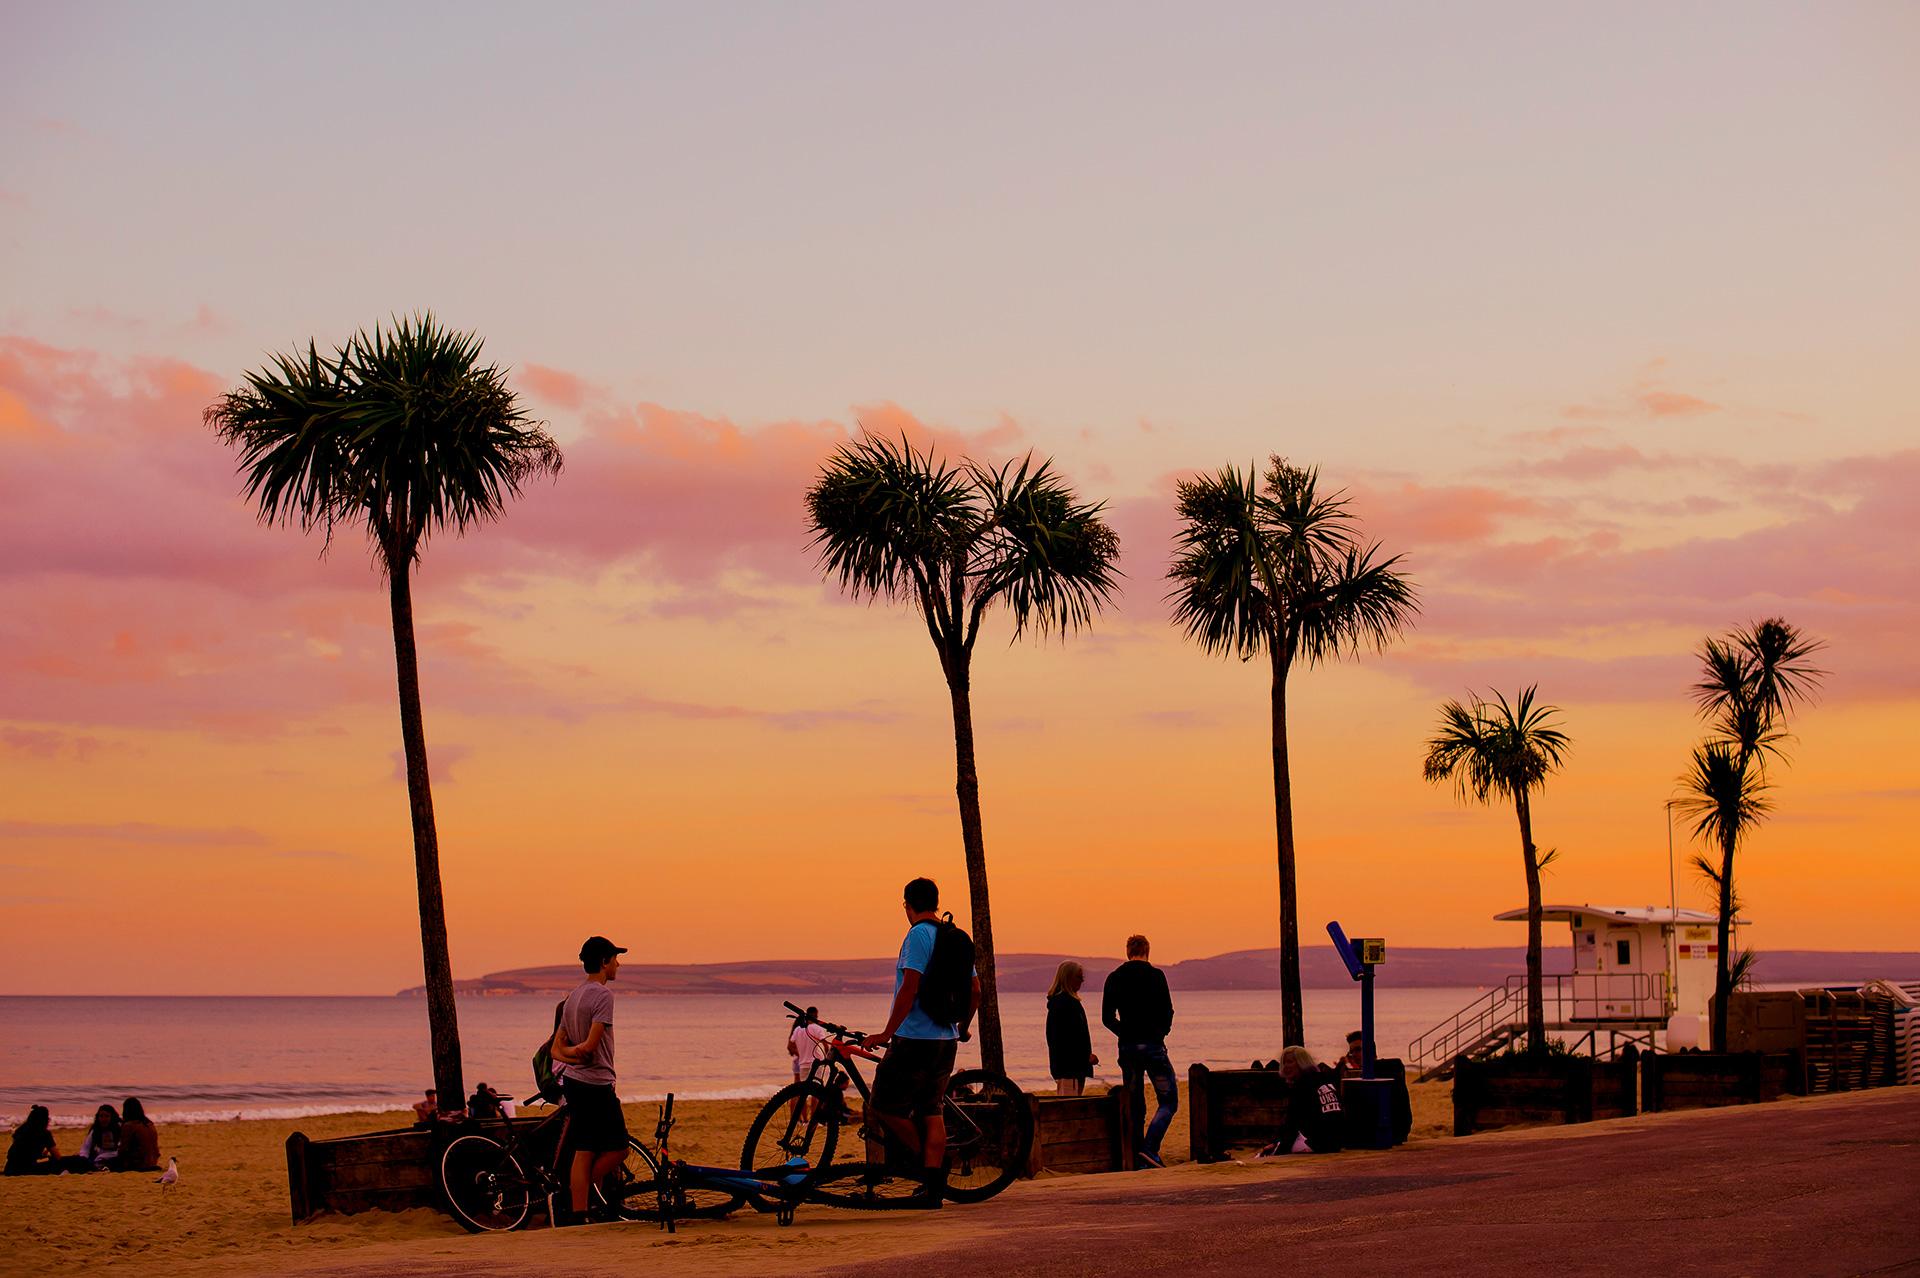 California style orange sky and palm tree